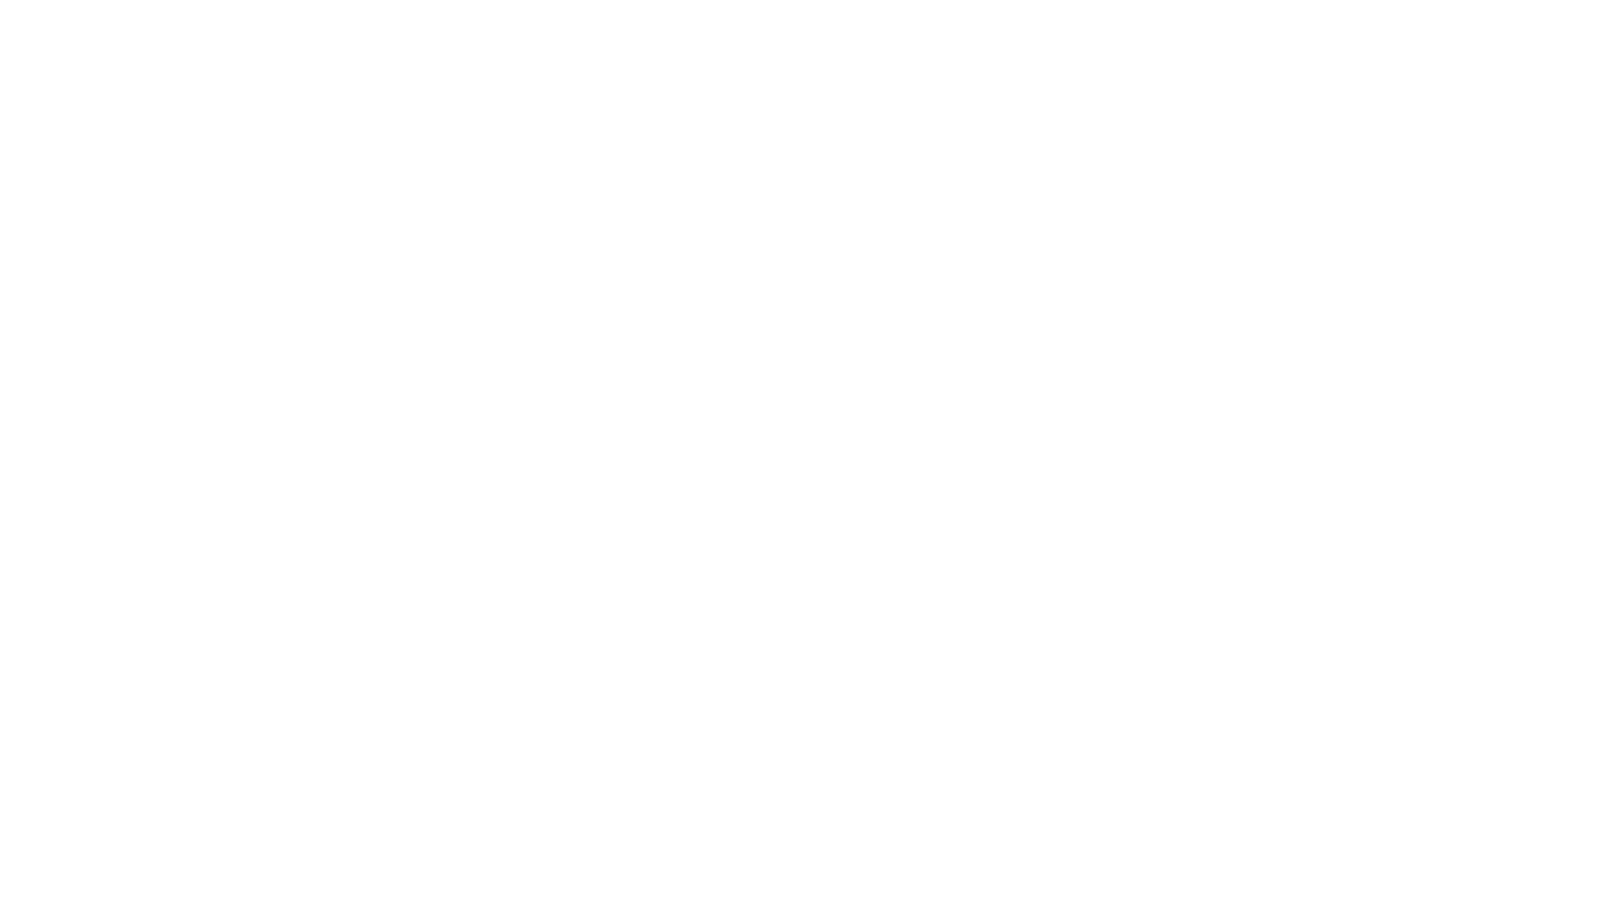 INI KATA MEREKA Merupakan program berbagi cerita, pendapat, ataupun opini pribadi dalam menanggapi suatu isu, hal yang trending maupun peristiwa. Program ini dikemas dalam bentuk video yang menampilkan orang yang menanggapi hal di atas di depan kamera dan dipublikasikan kepada publik.  Manager Producer : Kemas Prima Cameramen : Robby Aroct Crew : Syifa Nabila